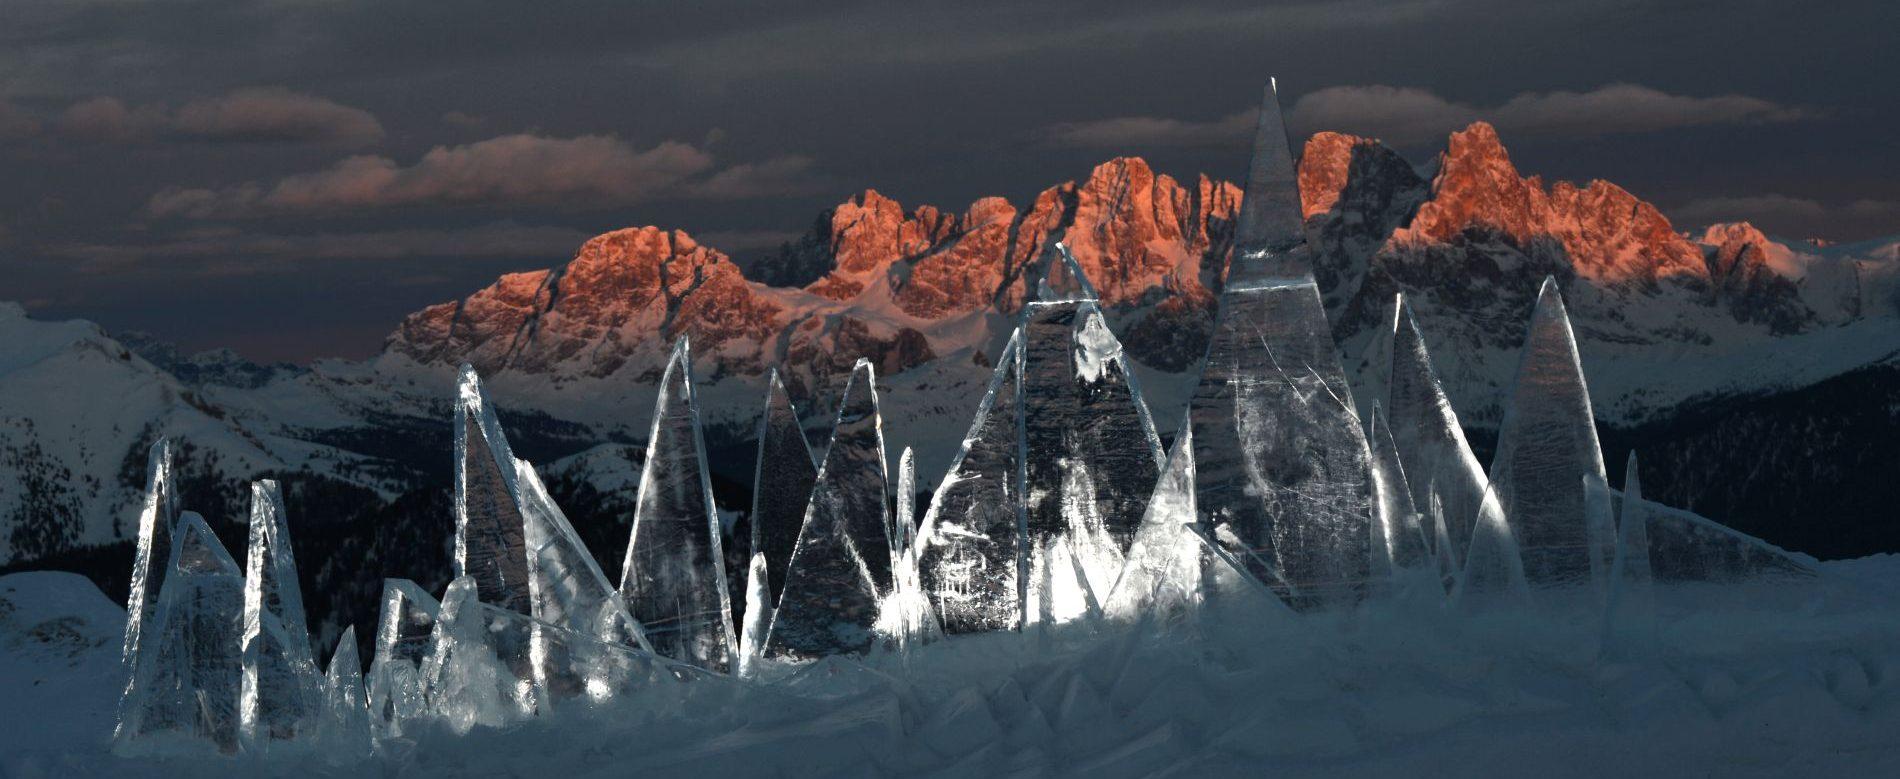 respirart-pampeago-ski center latemar-trentino alto adige